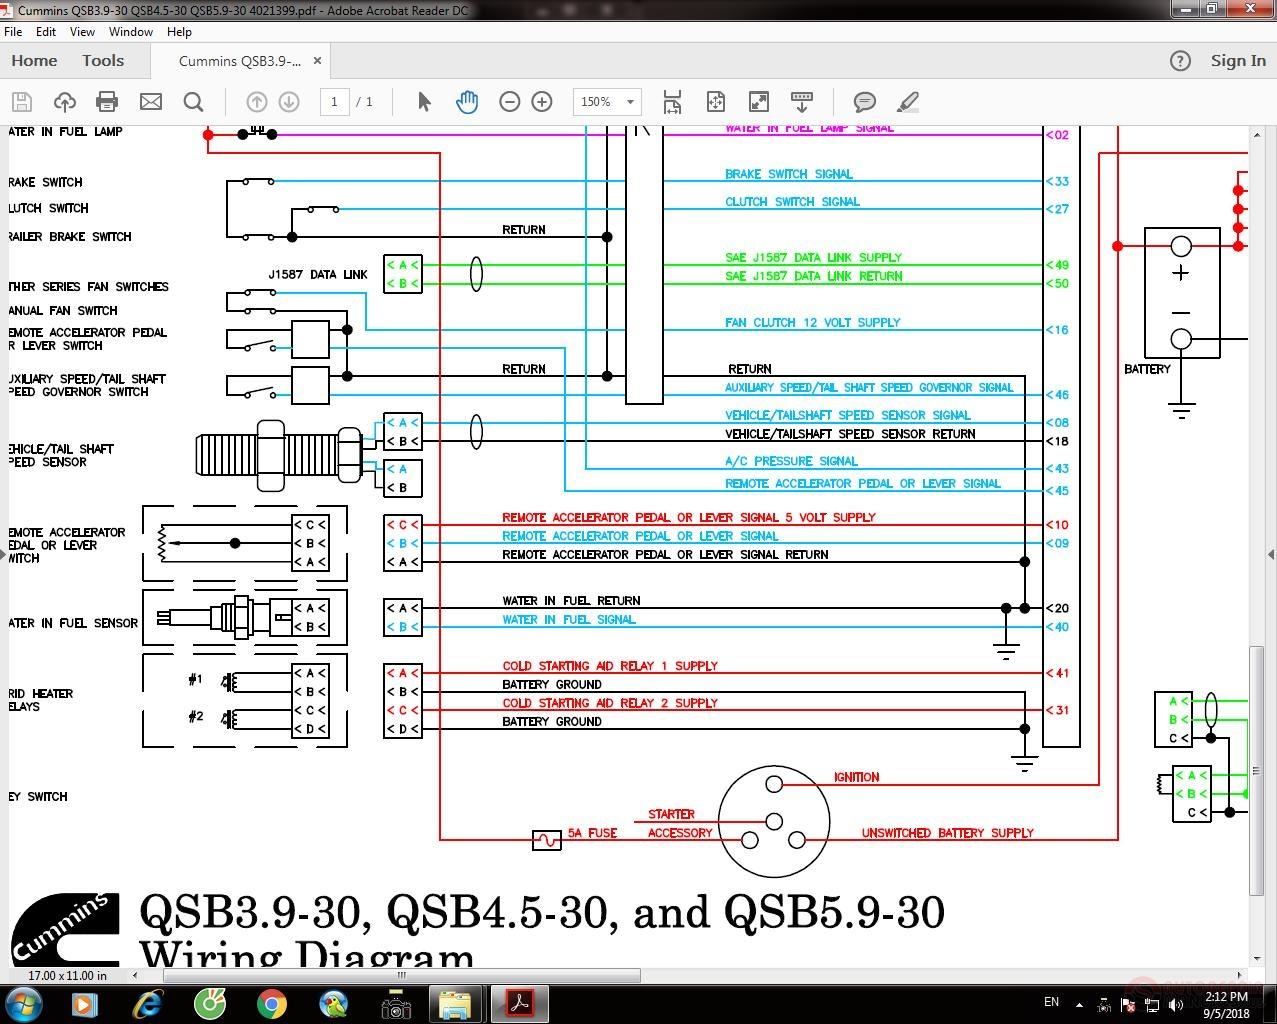 Cummins Qsb3 9-30 Qsb4 5-30 Qsb5 9-30 4021399 Wiring Diagram